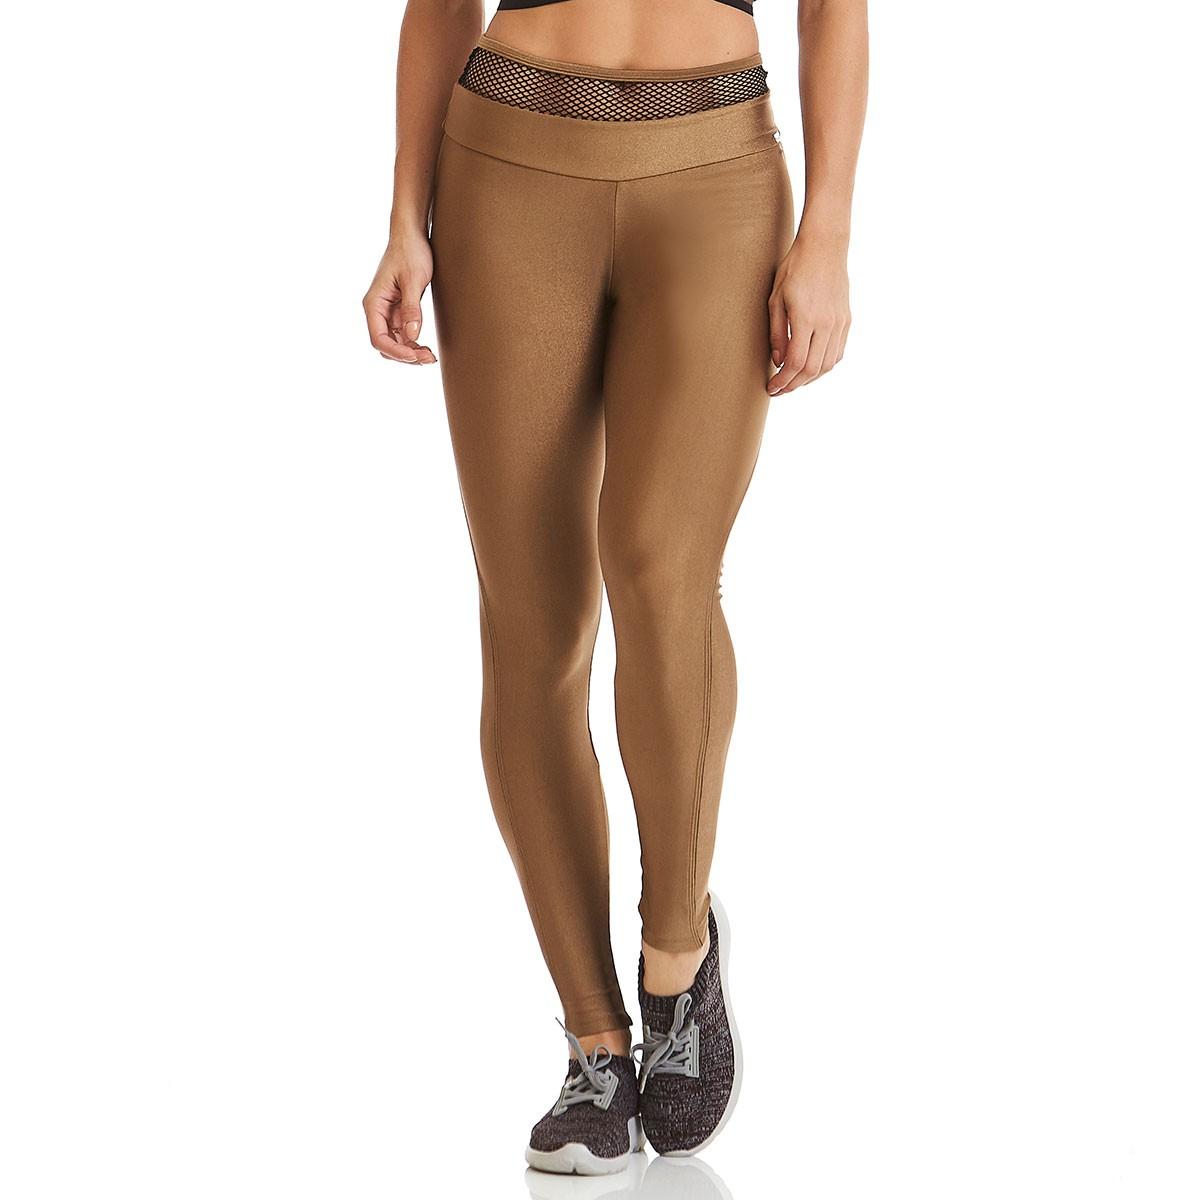 Legging Ocean Dourada CAJUBRASIL Activewear